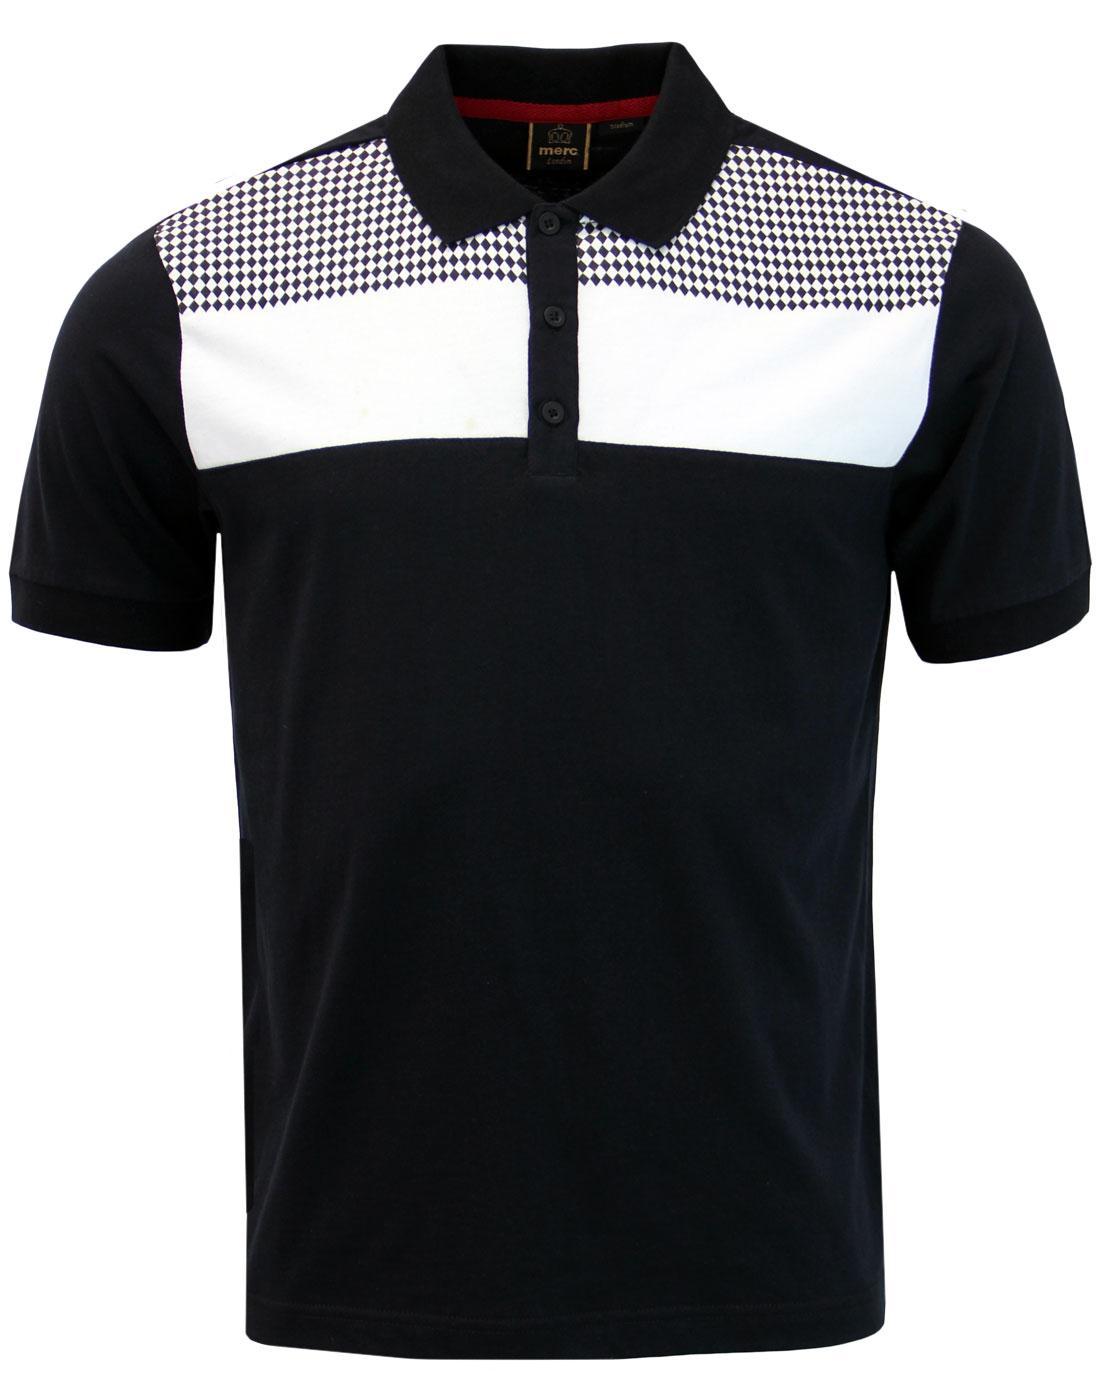 Howard MERC Retro Mod Diamond Panel Polo Shirt